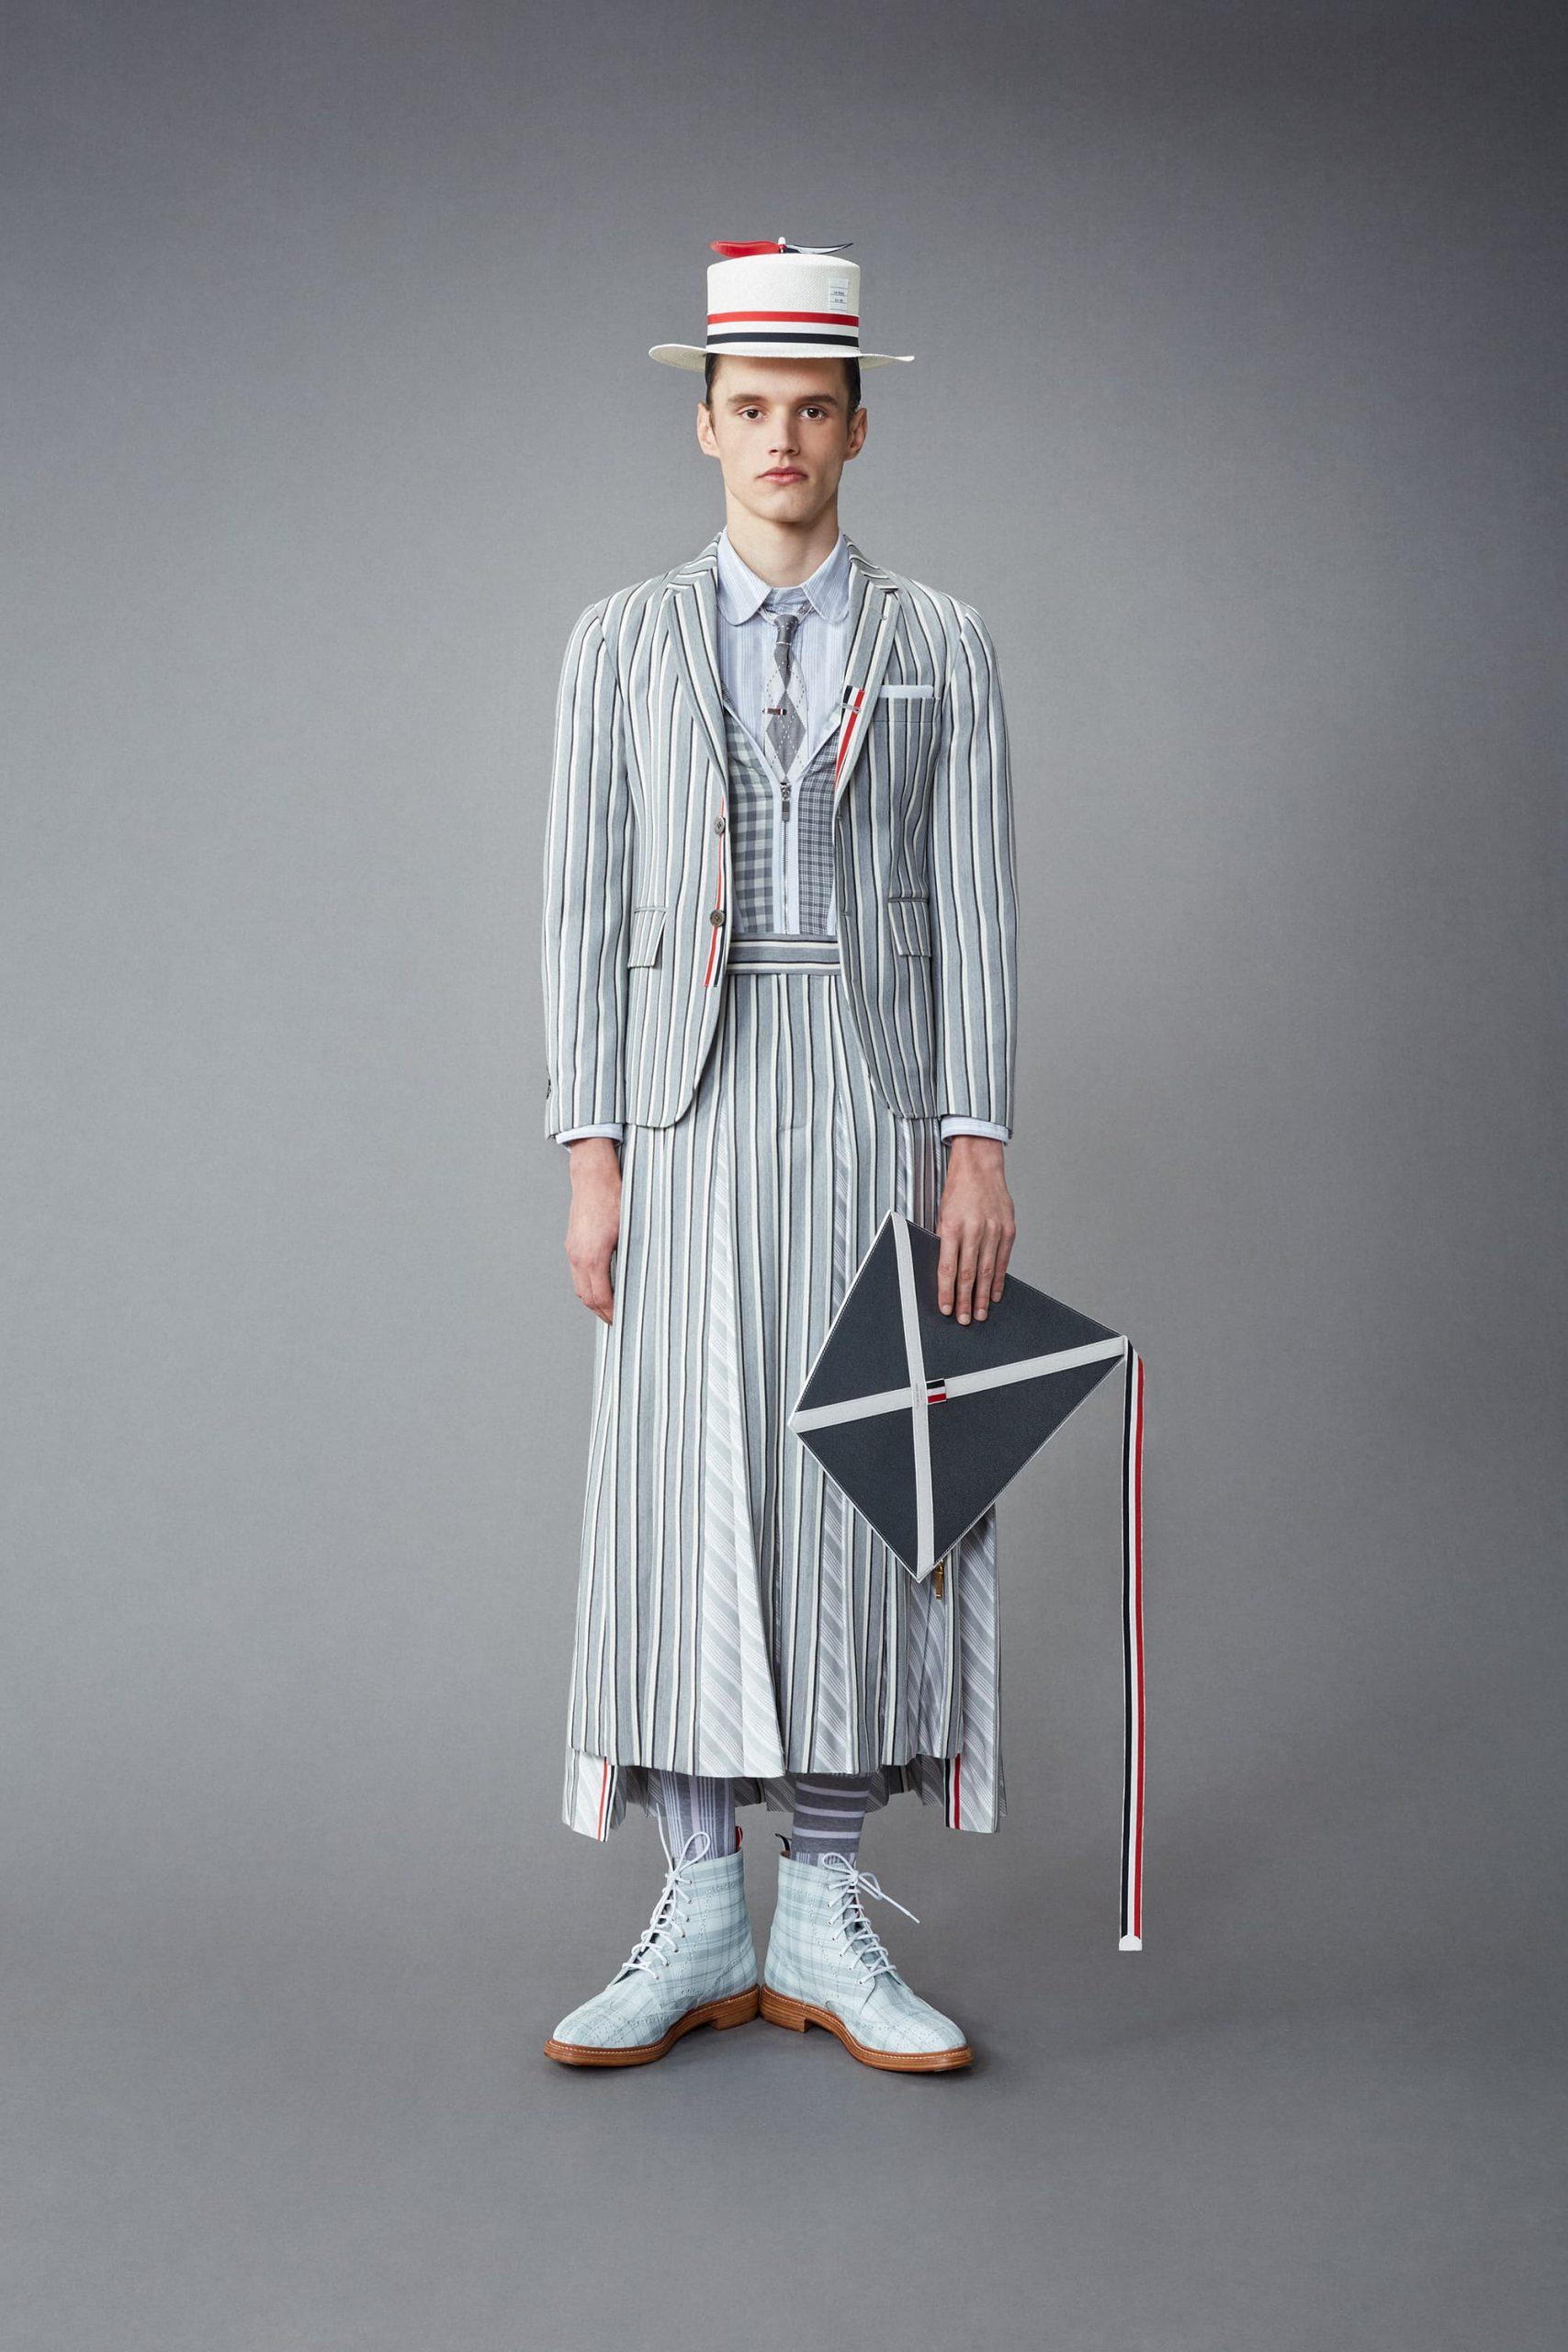 Thom Browne Resort 2022 Men's Fashion Show Photos